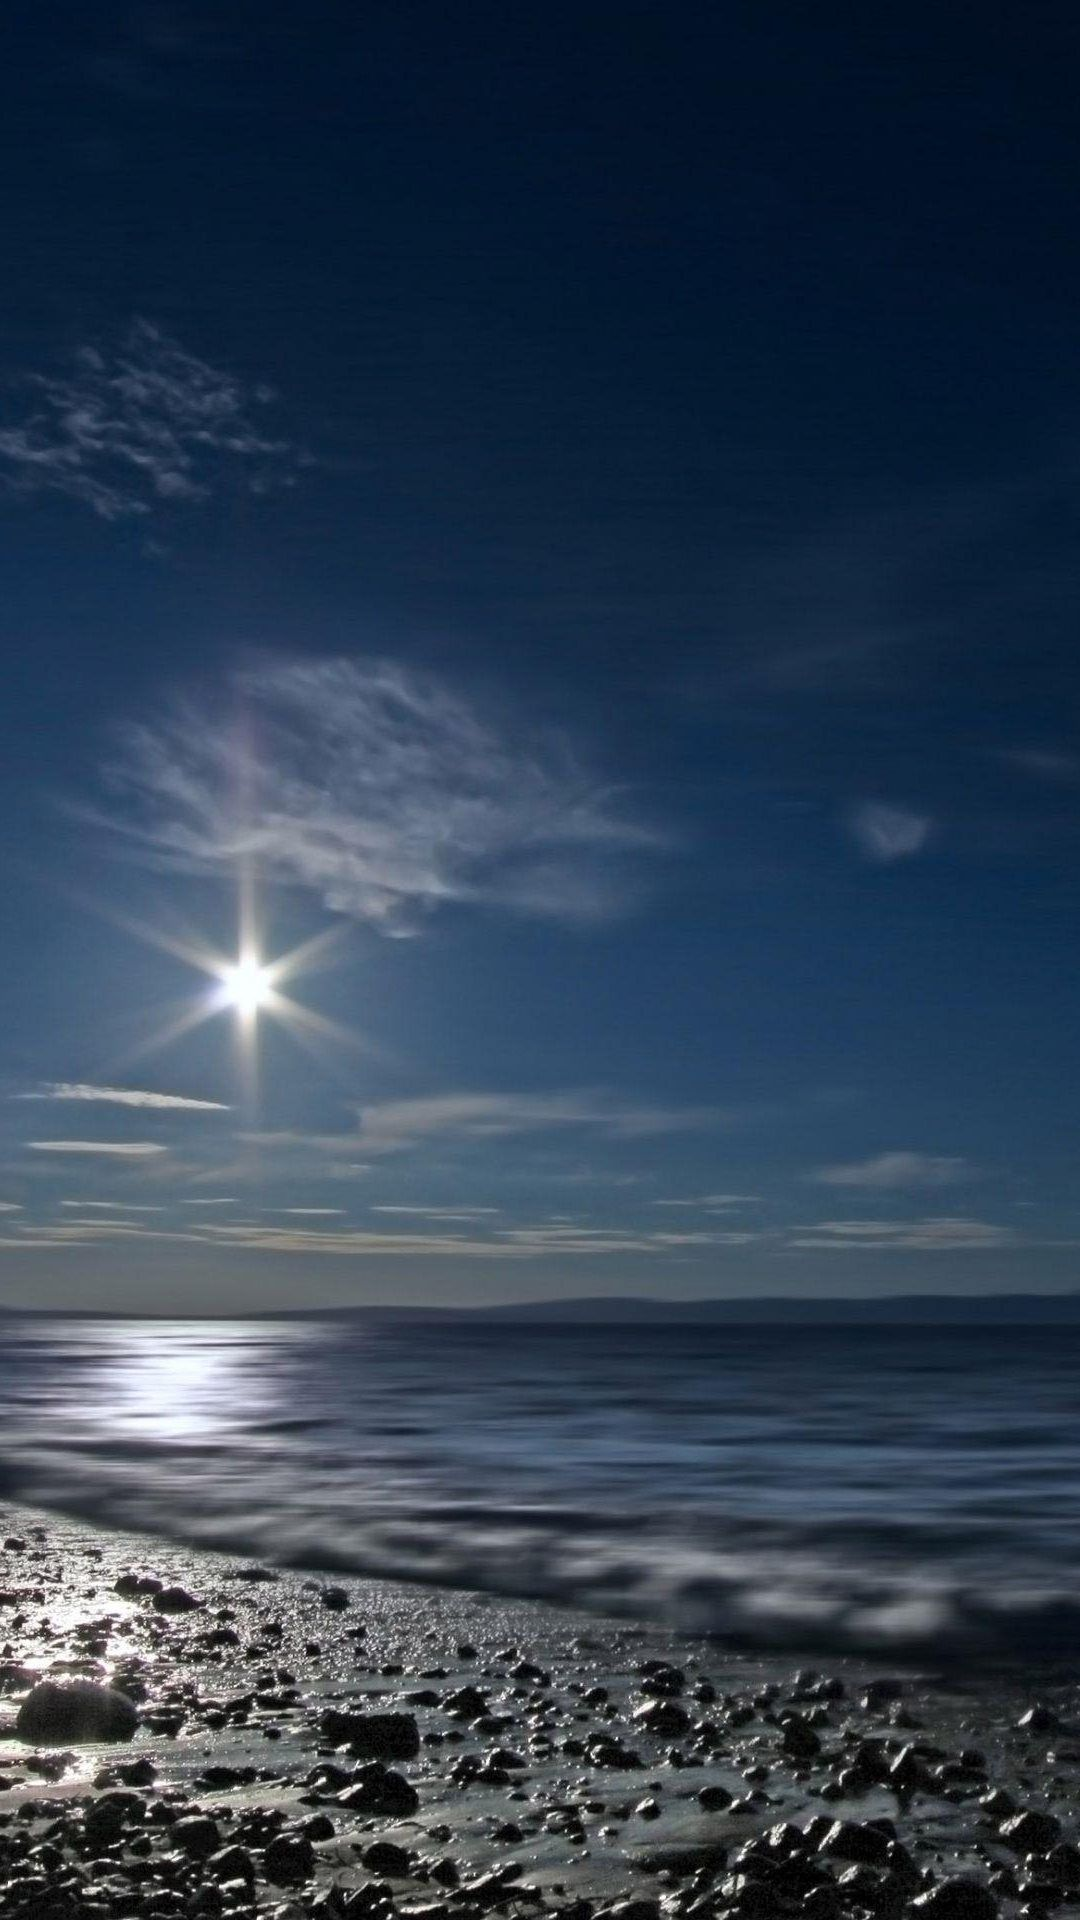 Wallpaper iphone moon - Shining Moon Over Sea Iphone 7 Wallpaper